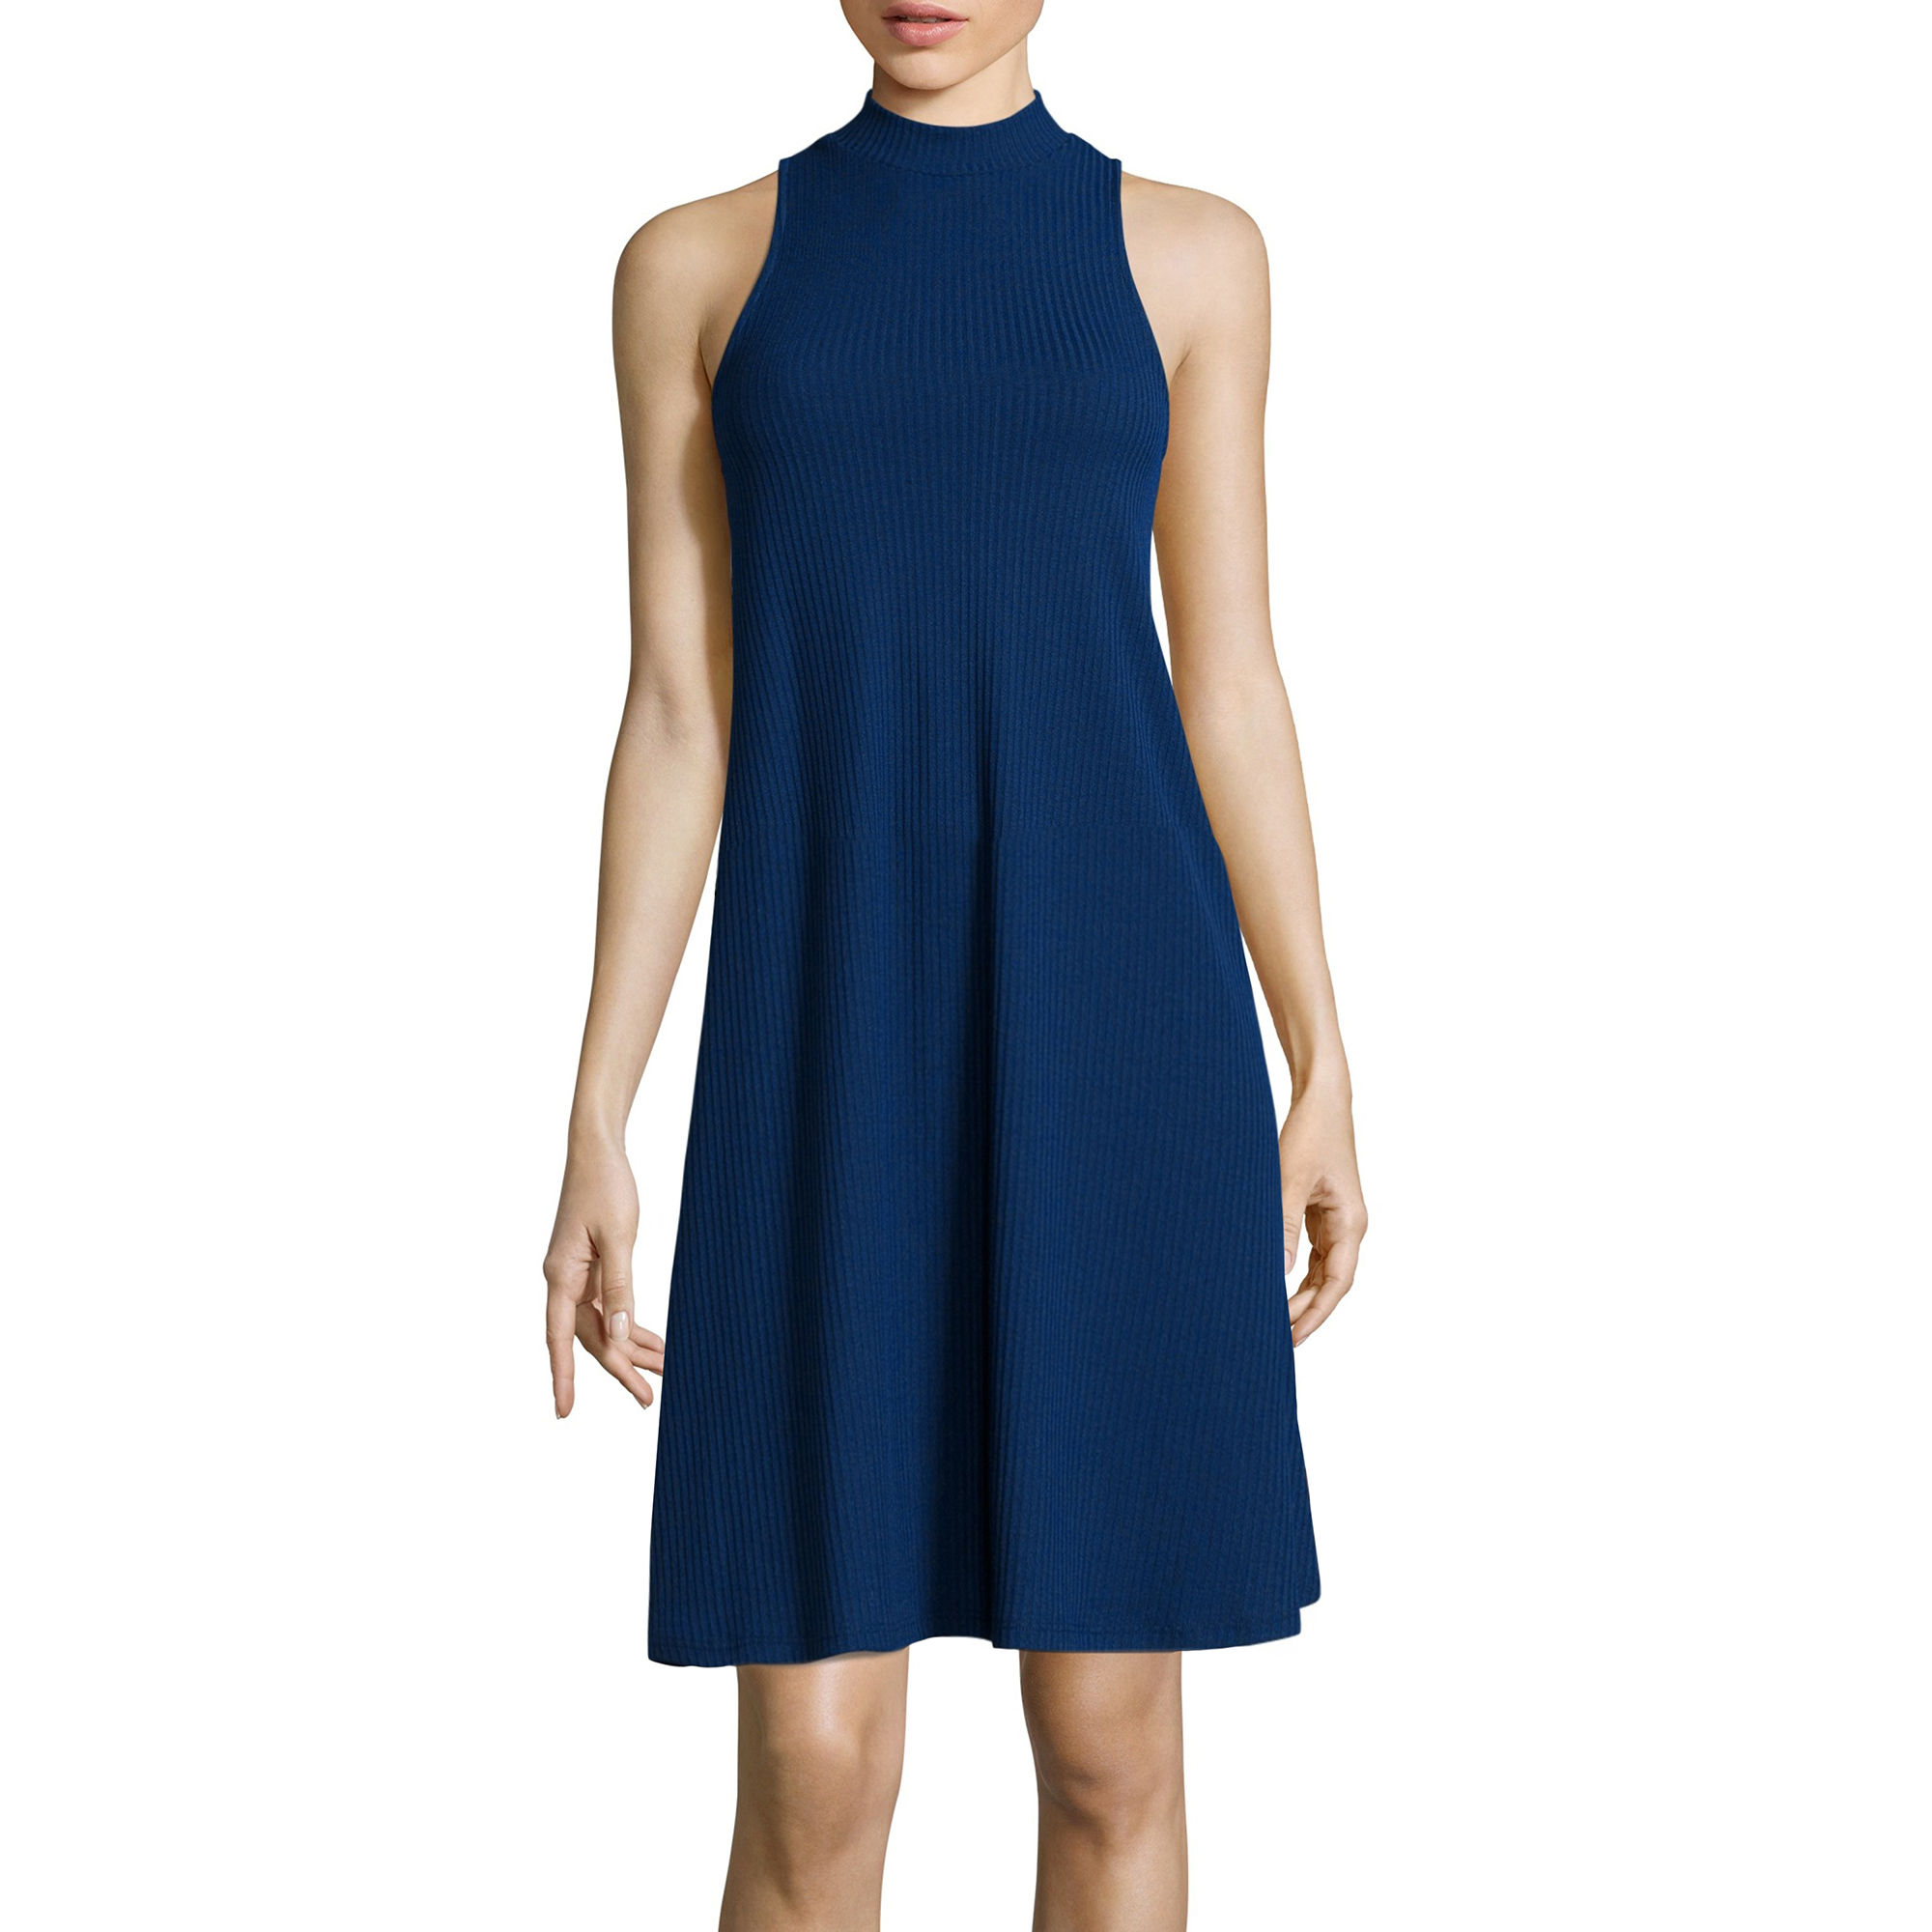 BELLE + SKY Sleeveless A-Line Swing Dress